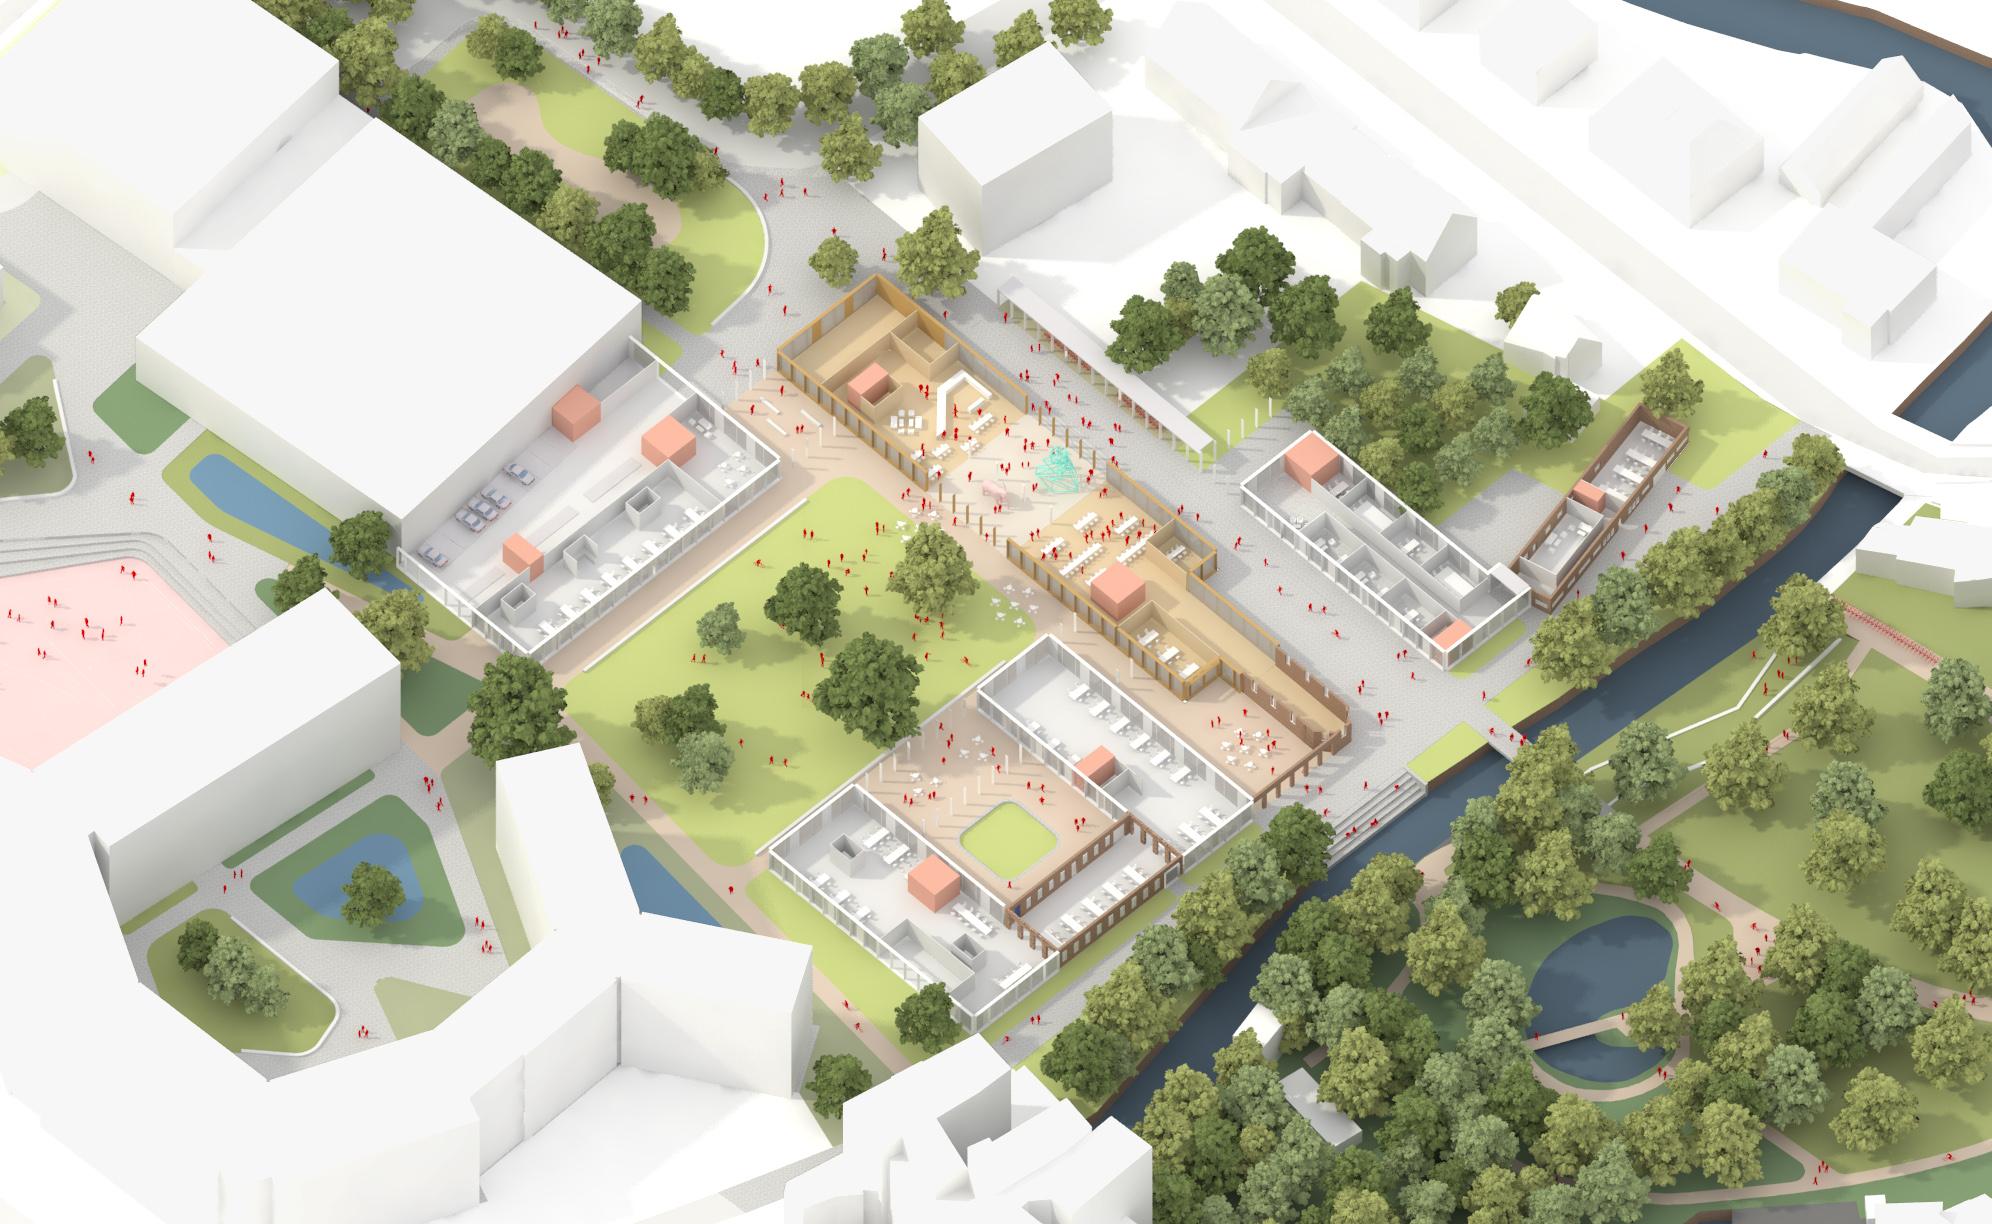 Redingensite Leuven - RAU Architects - Axon exploded no roof